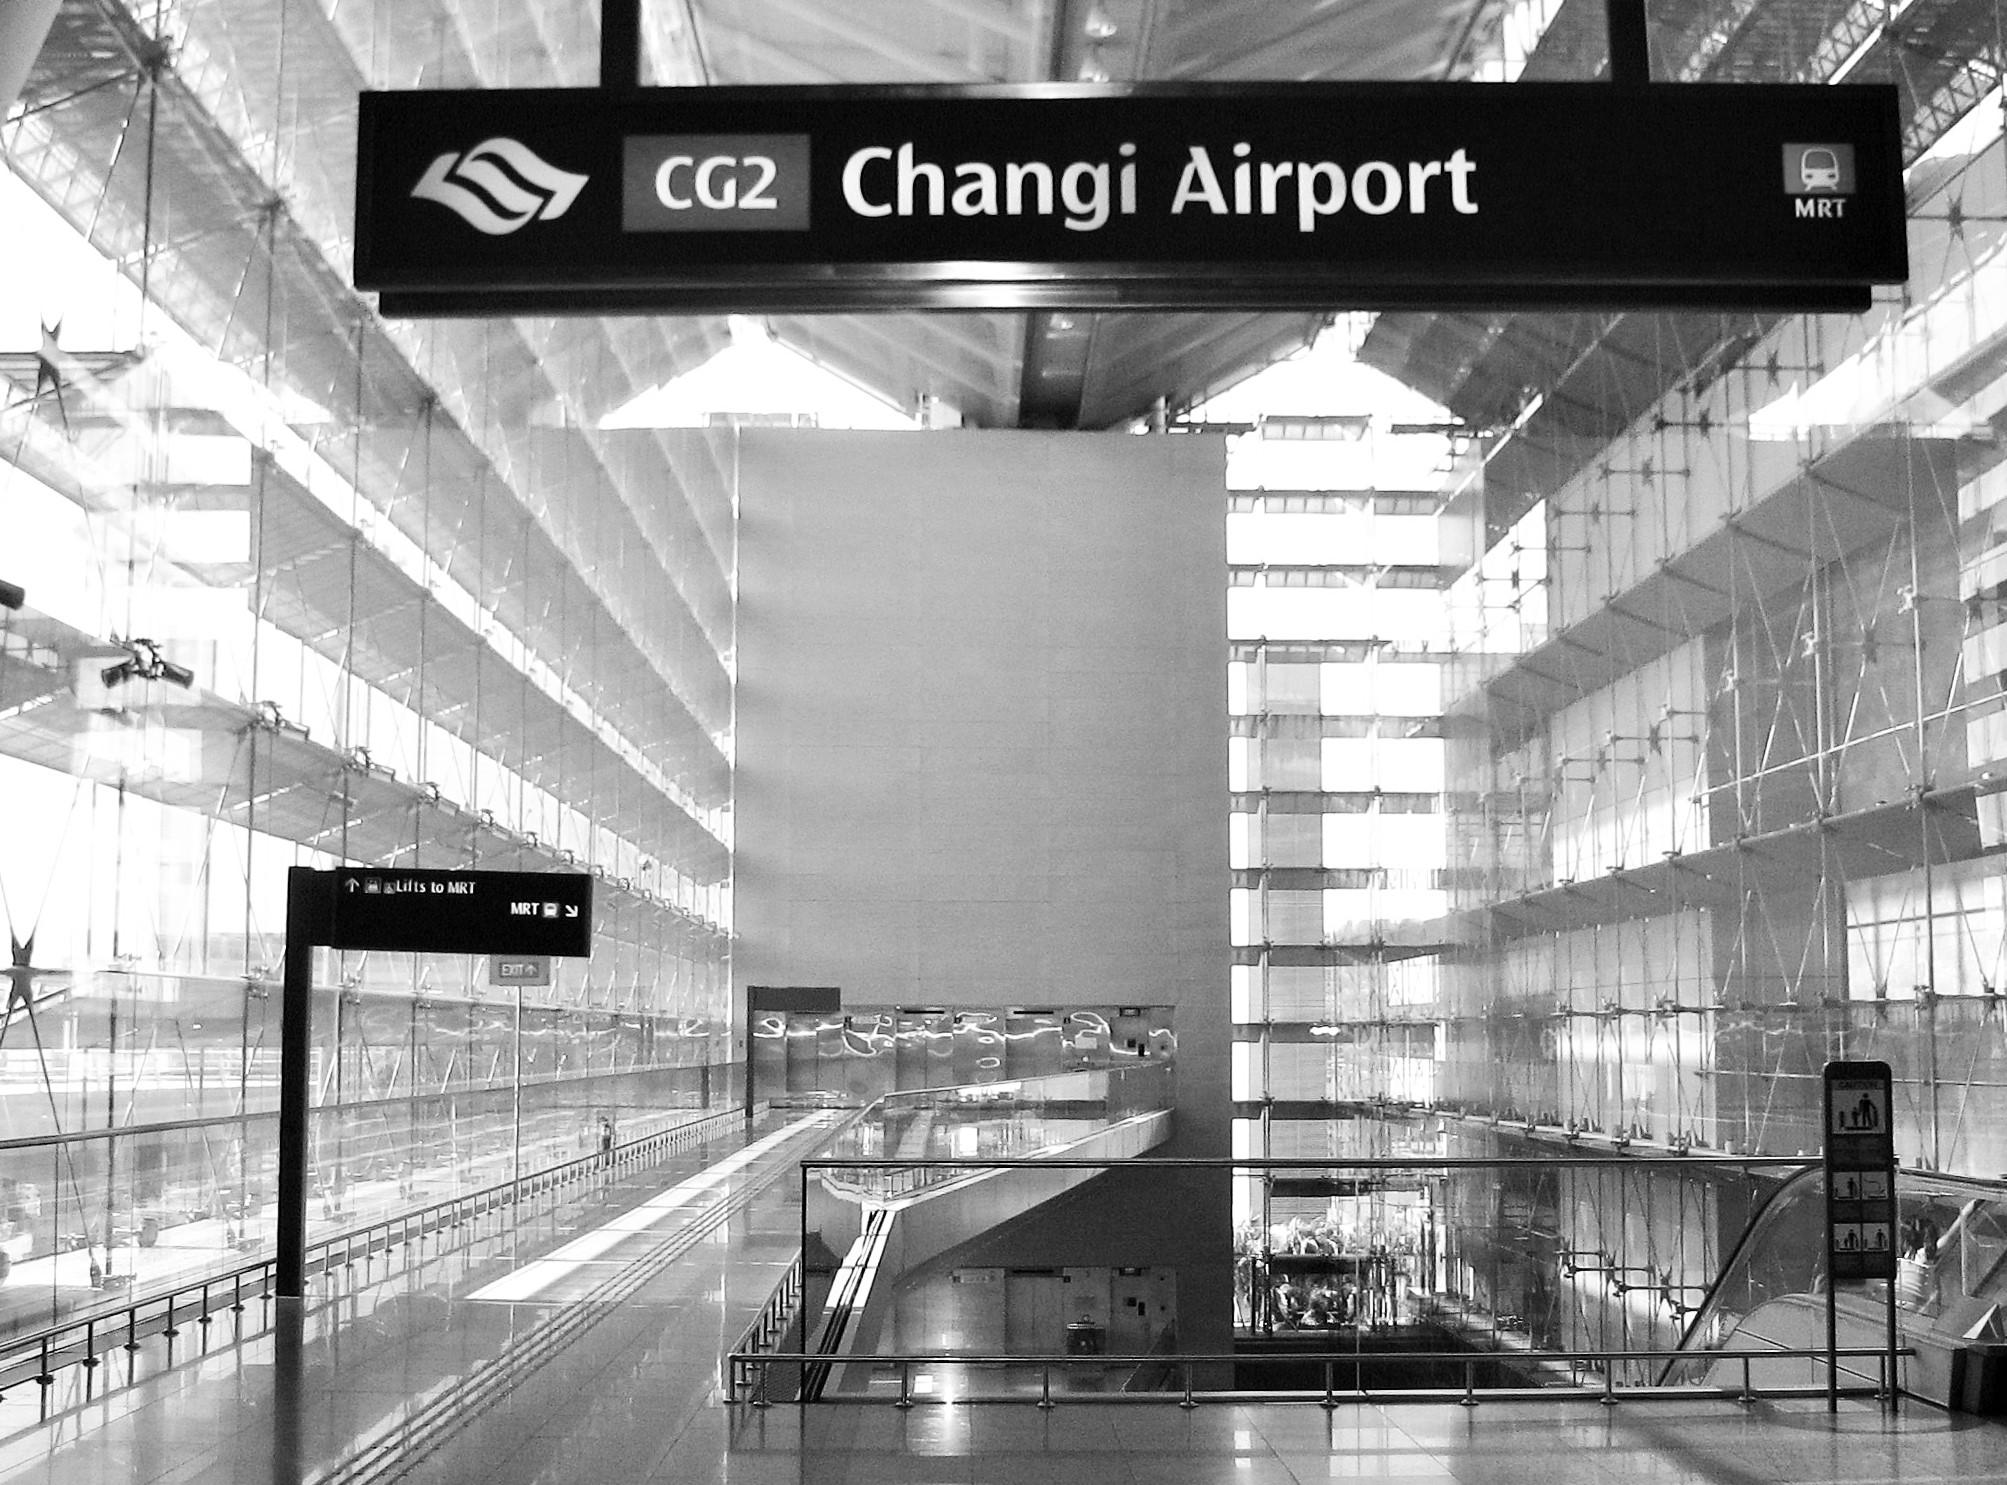 cg2_changi_airport_terminal_2_entrance.jpg